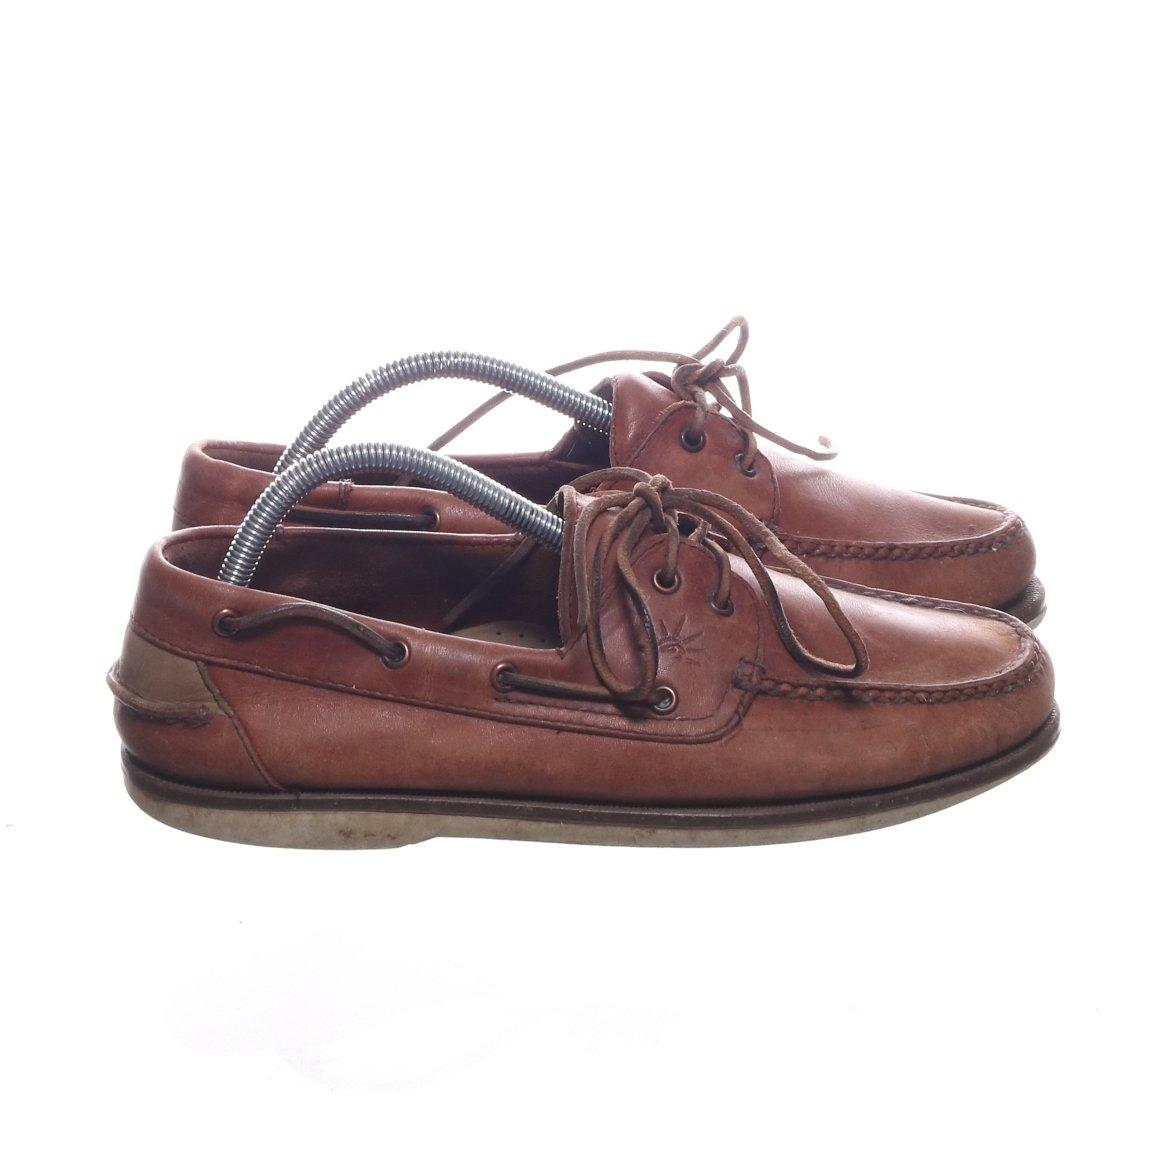 Fifth Avenue Shoe Repair, Loafers, Strl: 41, Skinn, Brun